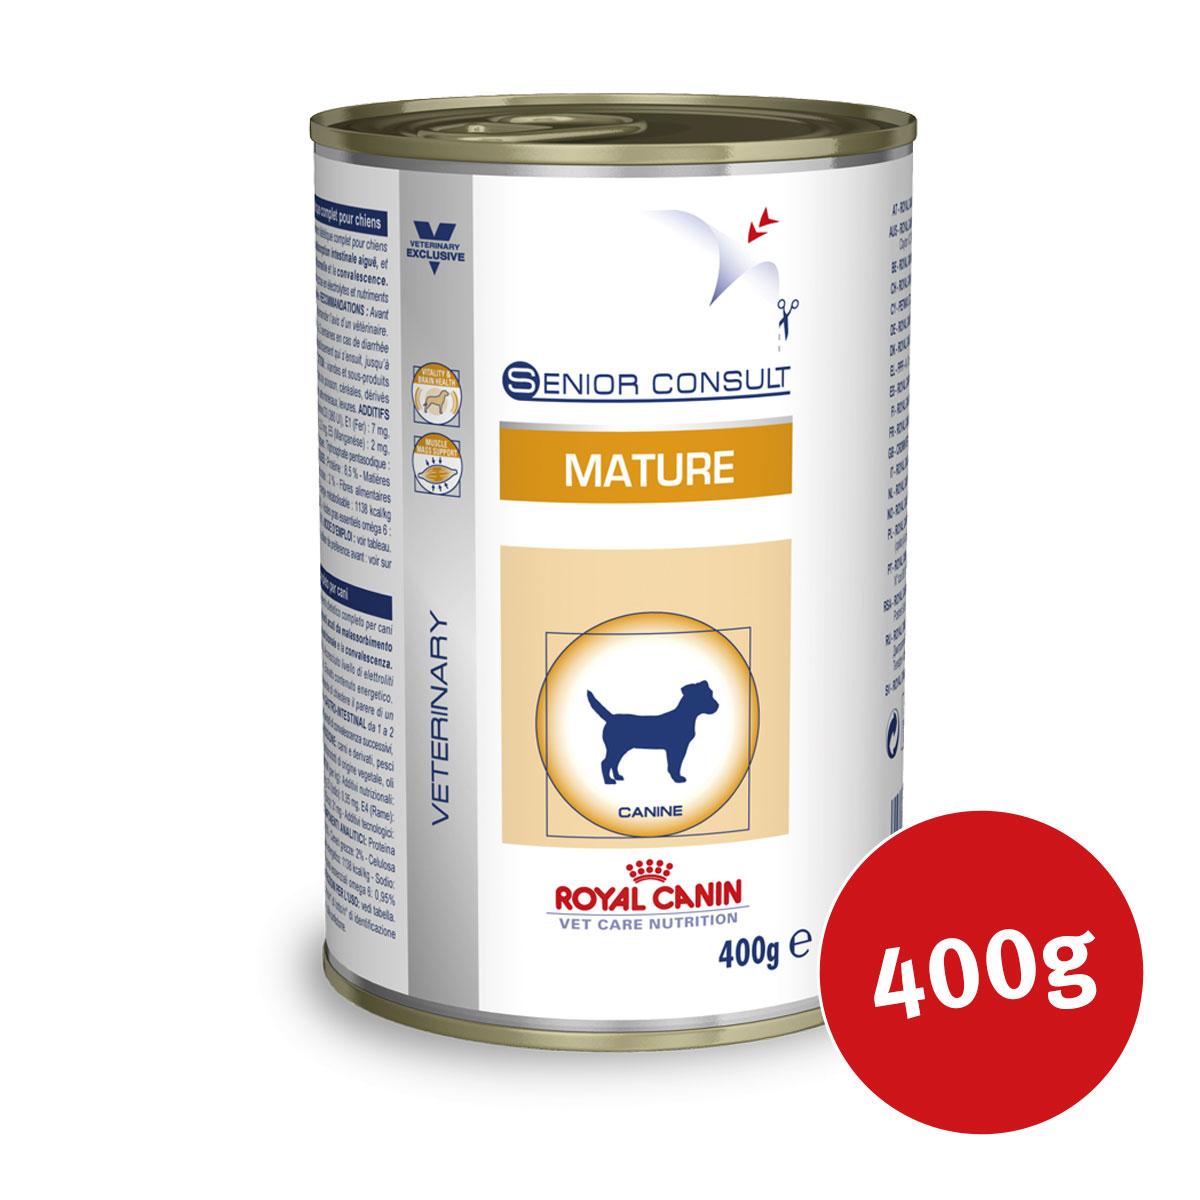 royal canin vet care nassfutter senior consult mature. Black Bedroom Furniture Sets. Home Design Ideas